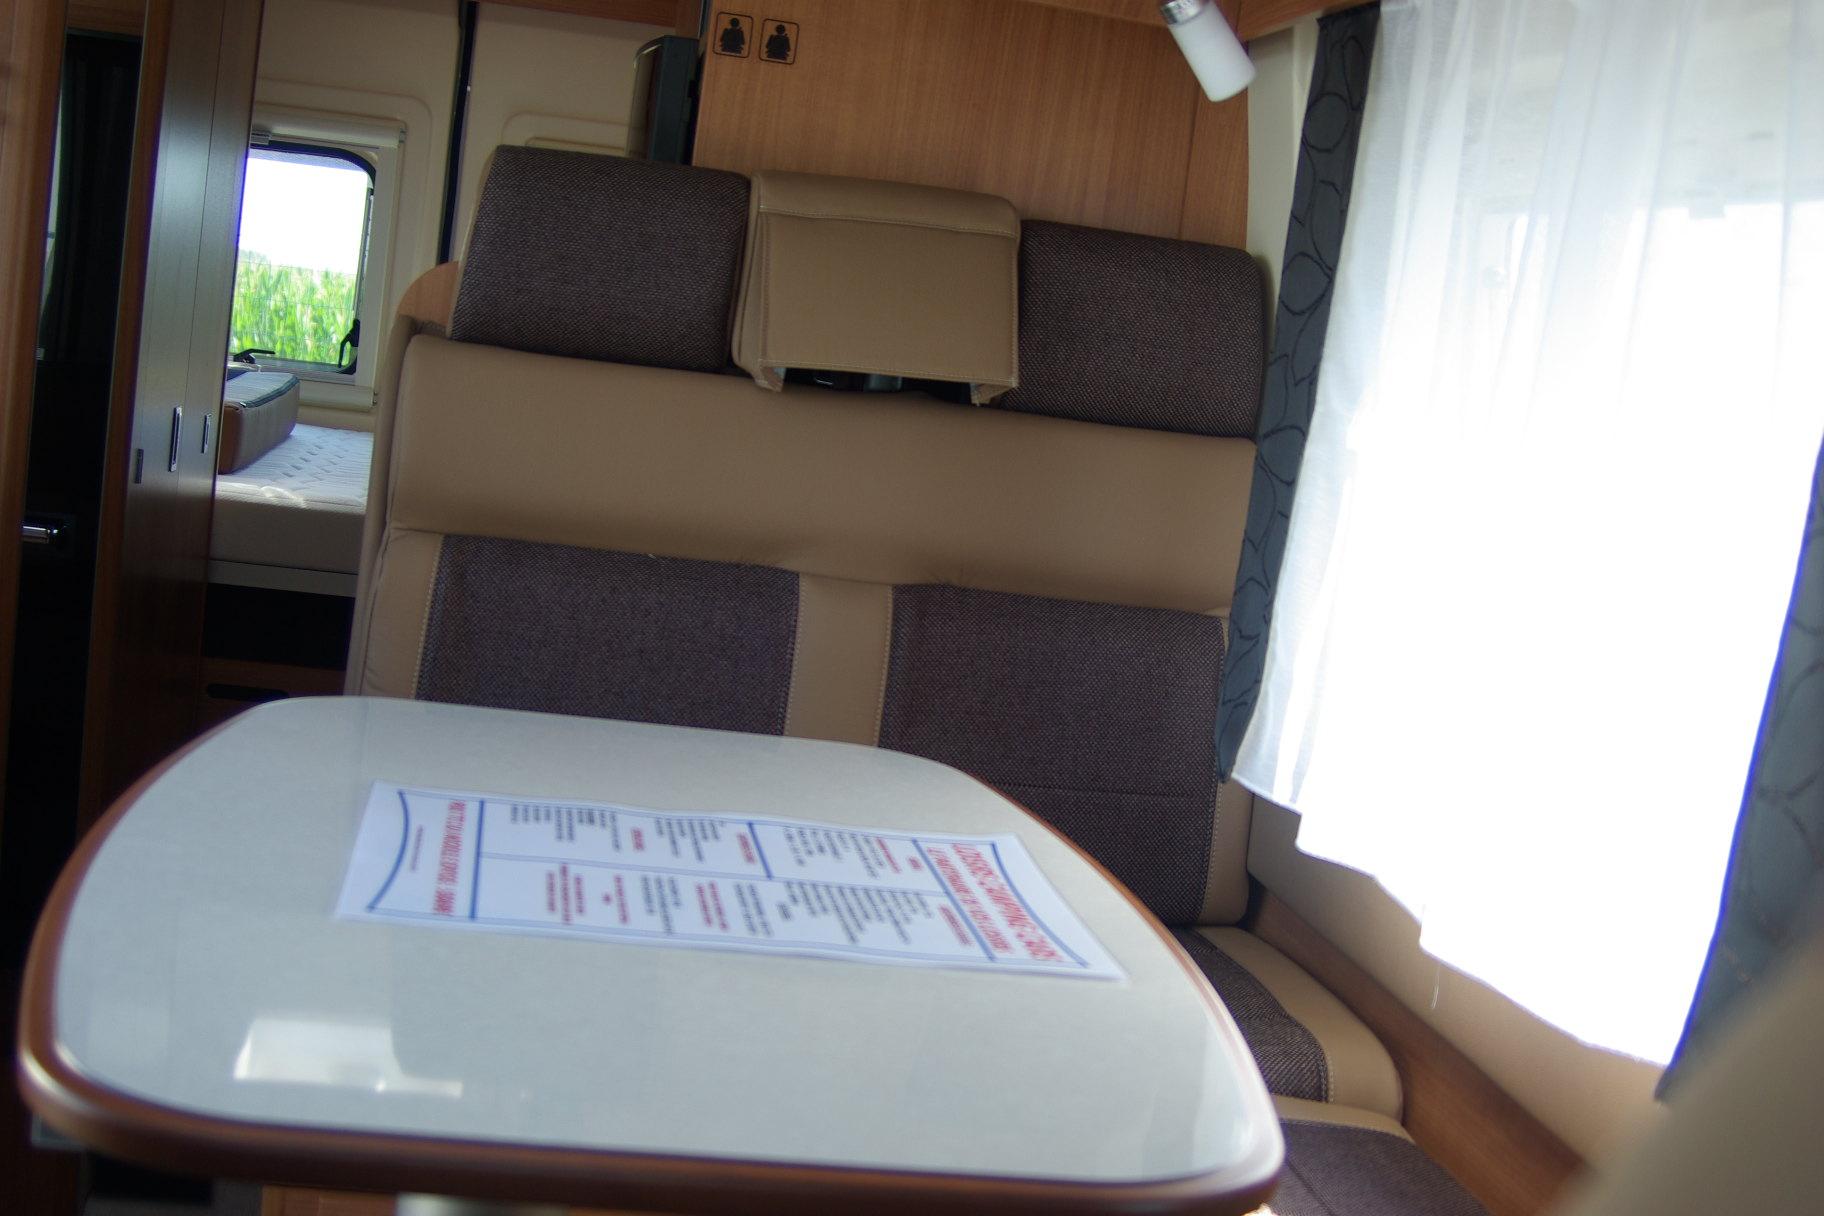 campereve magellan 743 neuf porteur fiat ducato 130cv camping car vendre en rhin 67. Black Bedroom Furniture Sets. Home Design Ideas